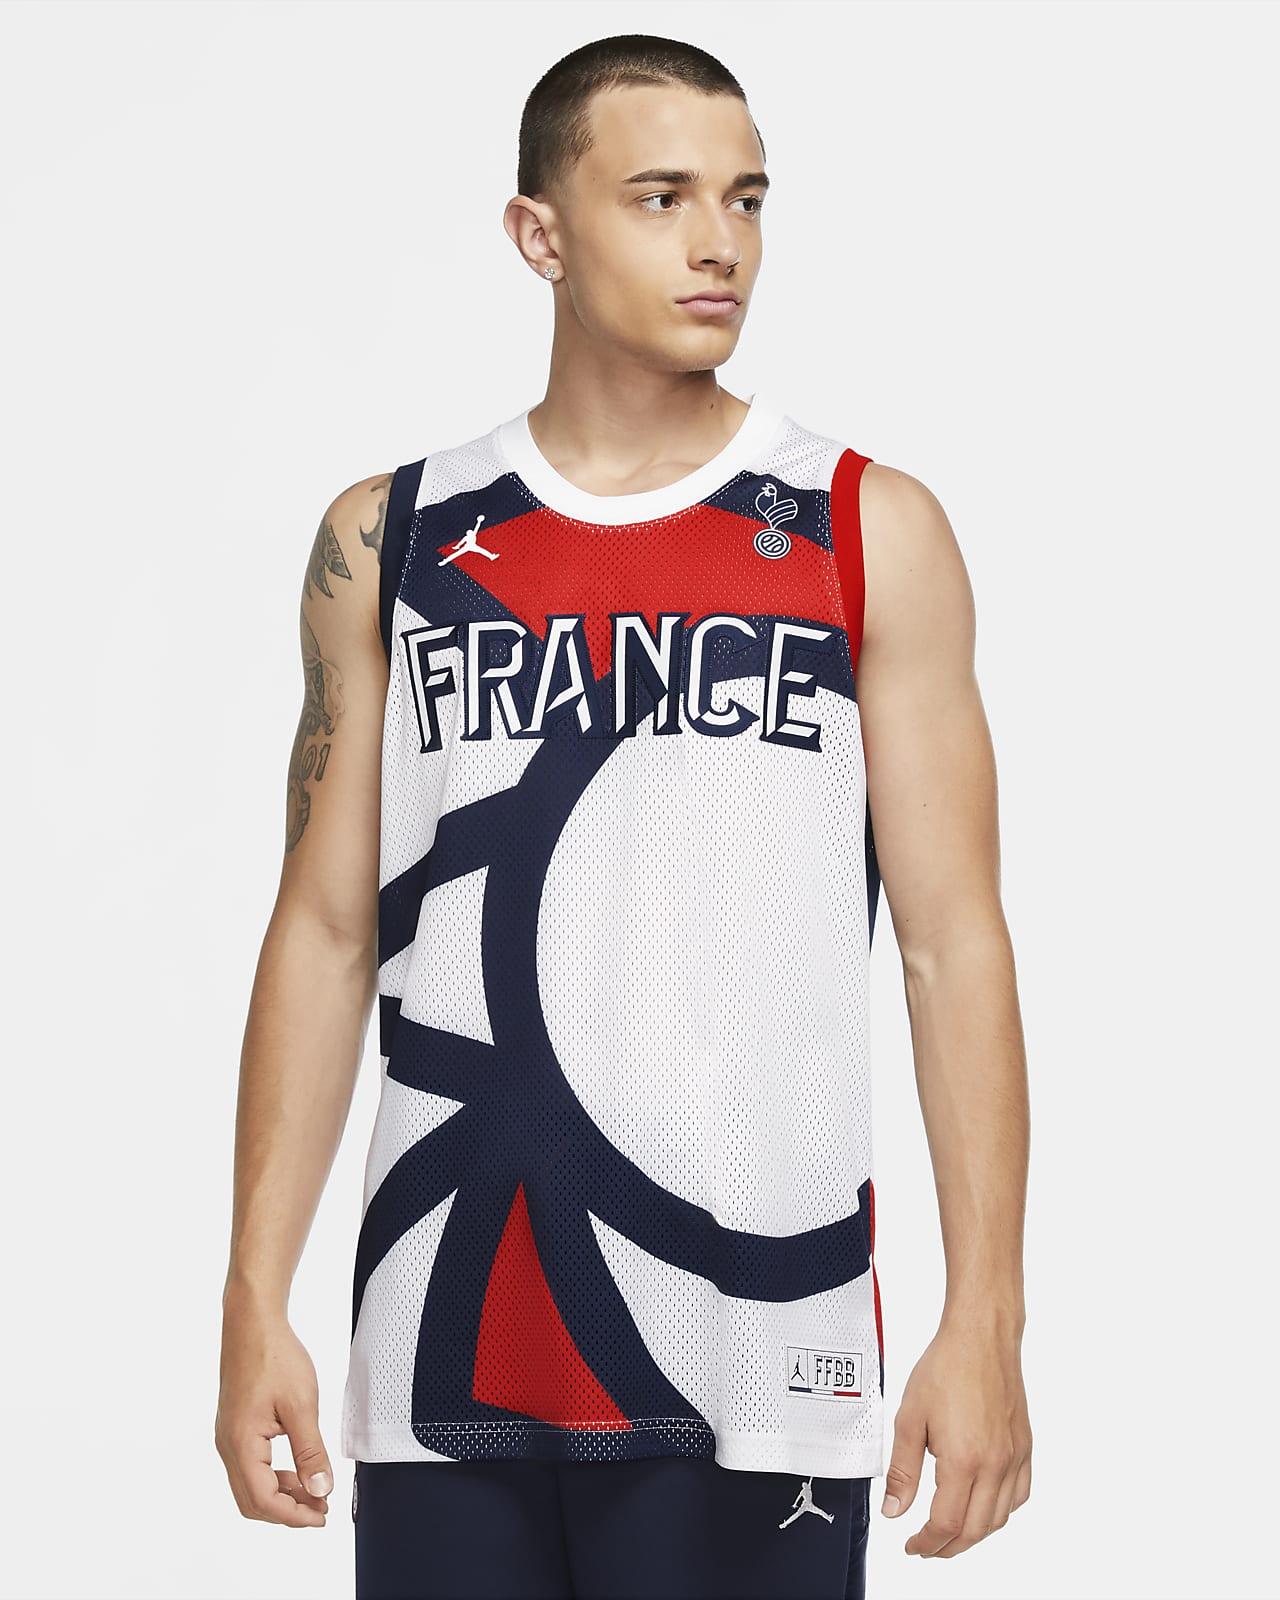 Frankreich Jordan Jumpman Herrentrikot